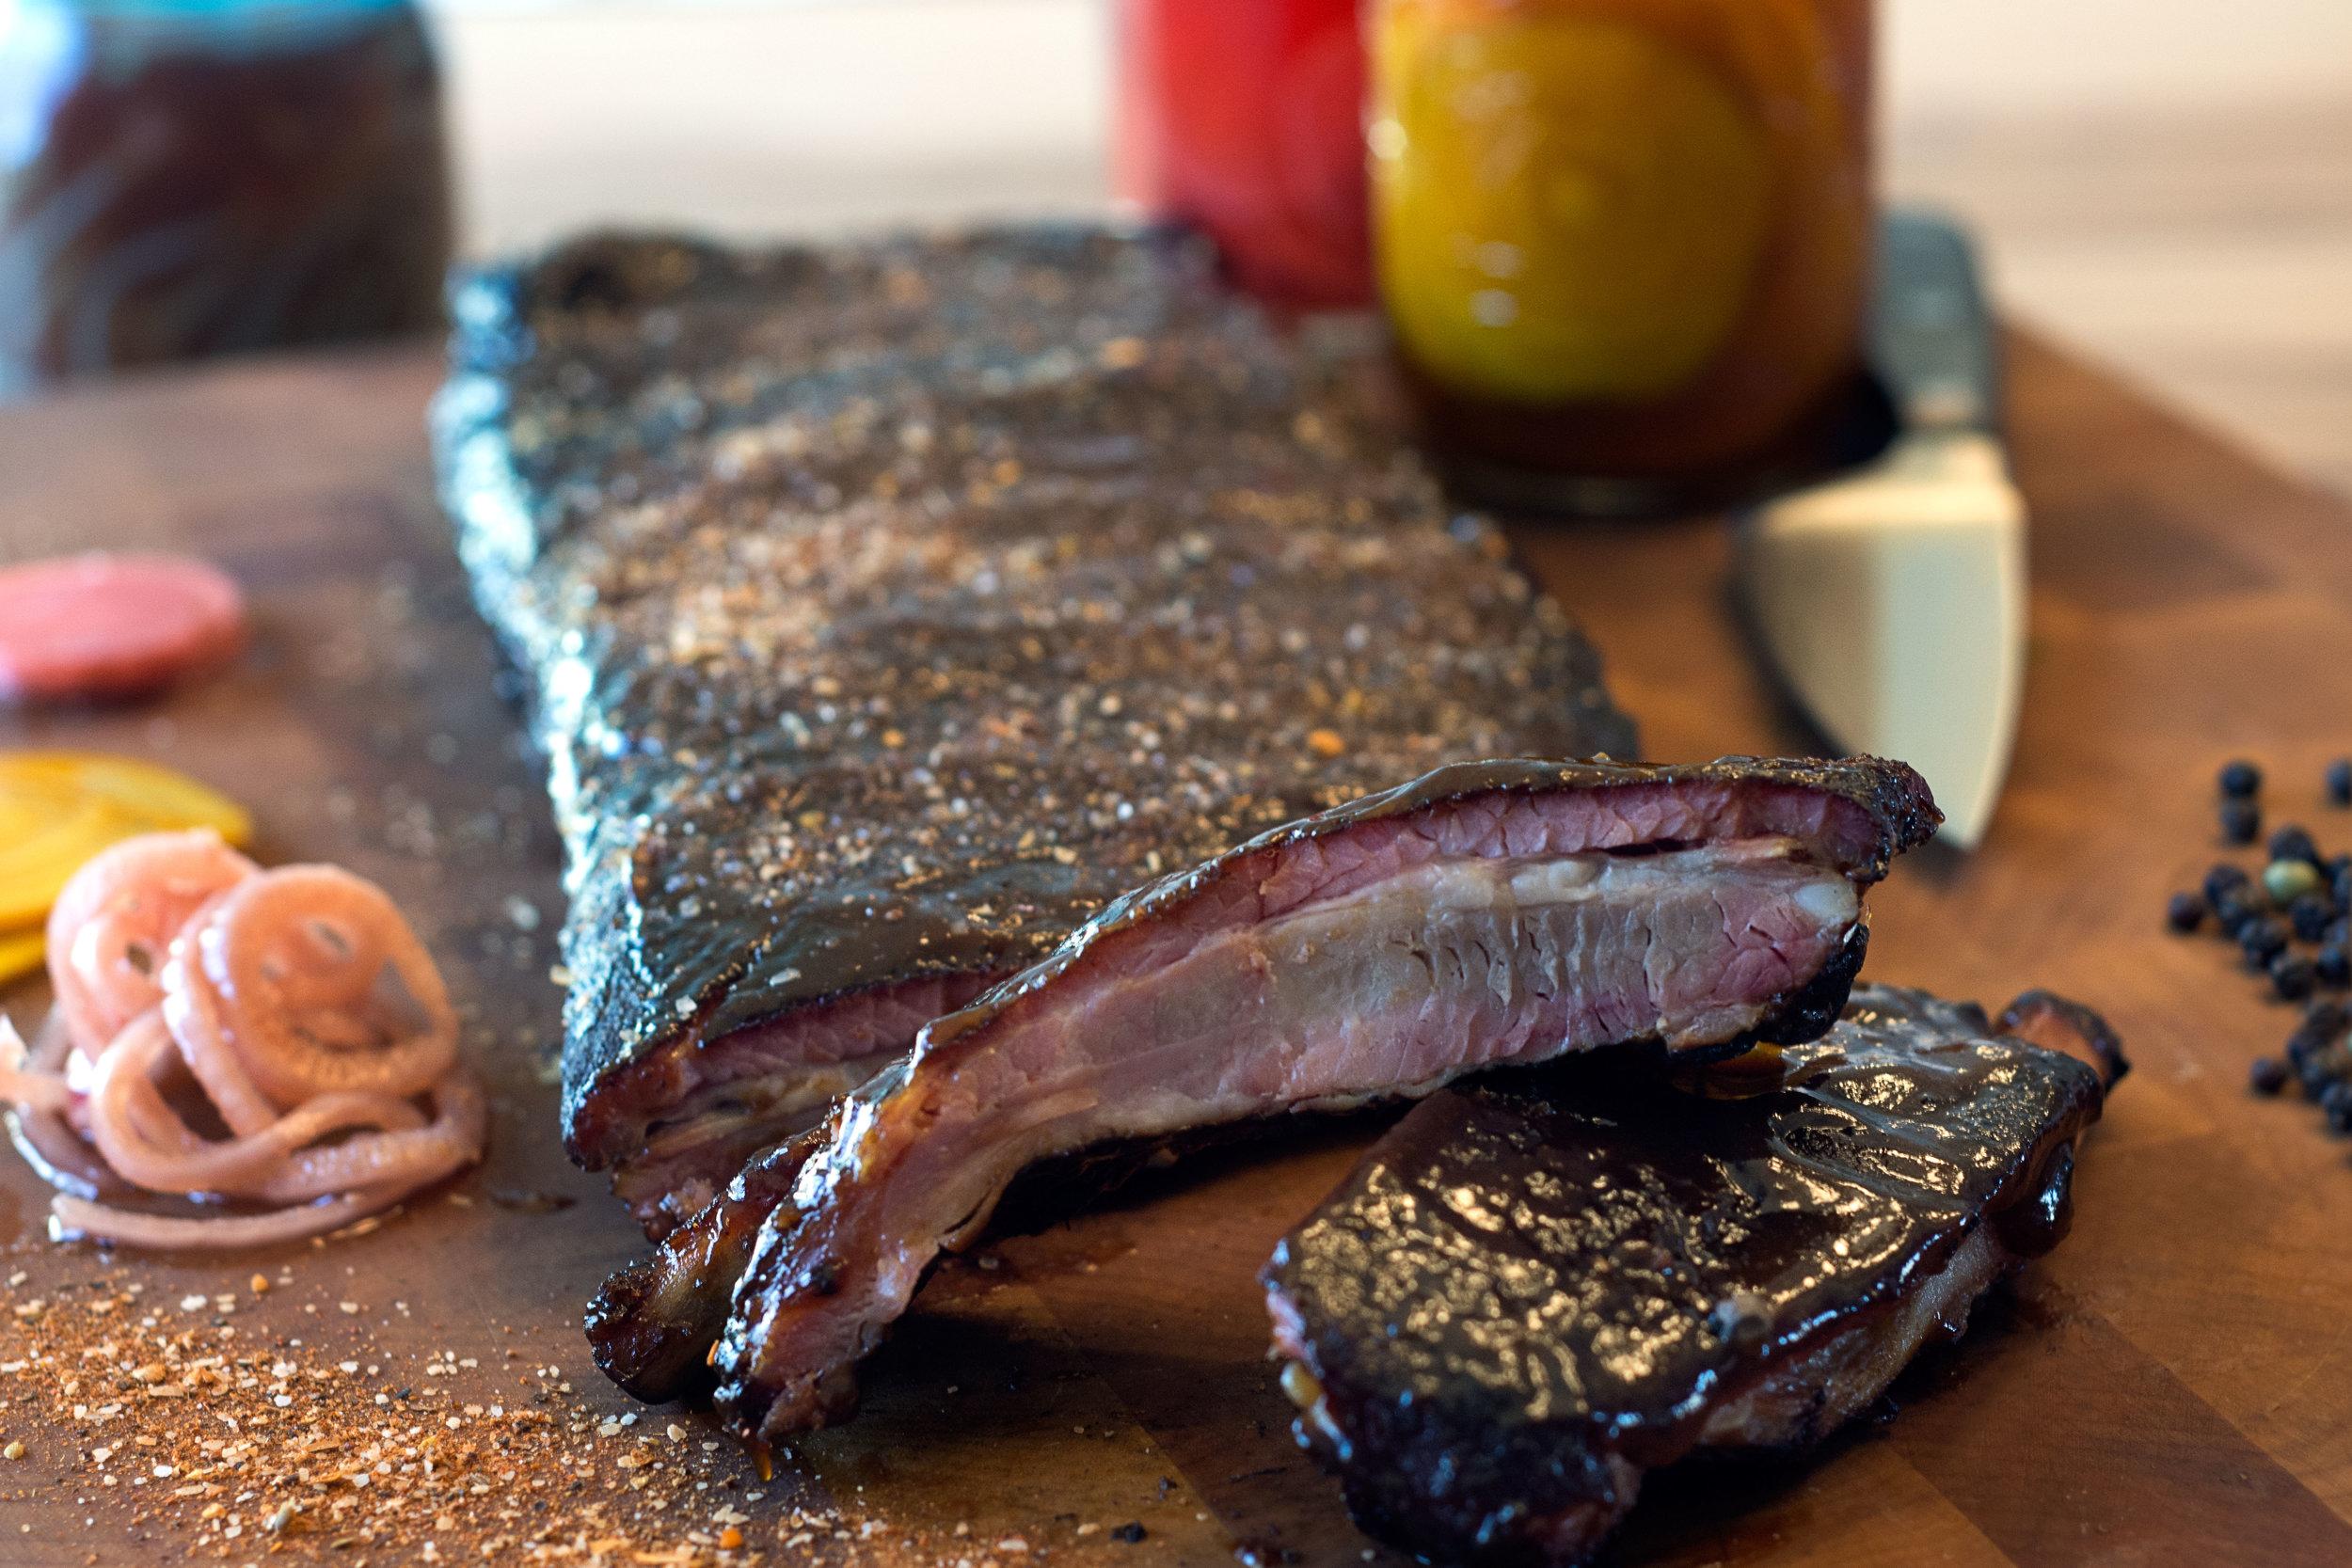 Pork ribs with housemade sauce